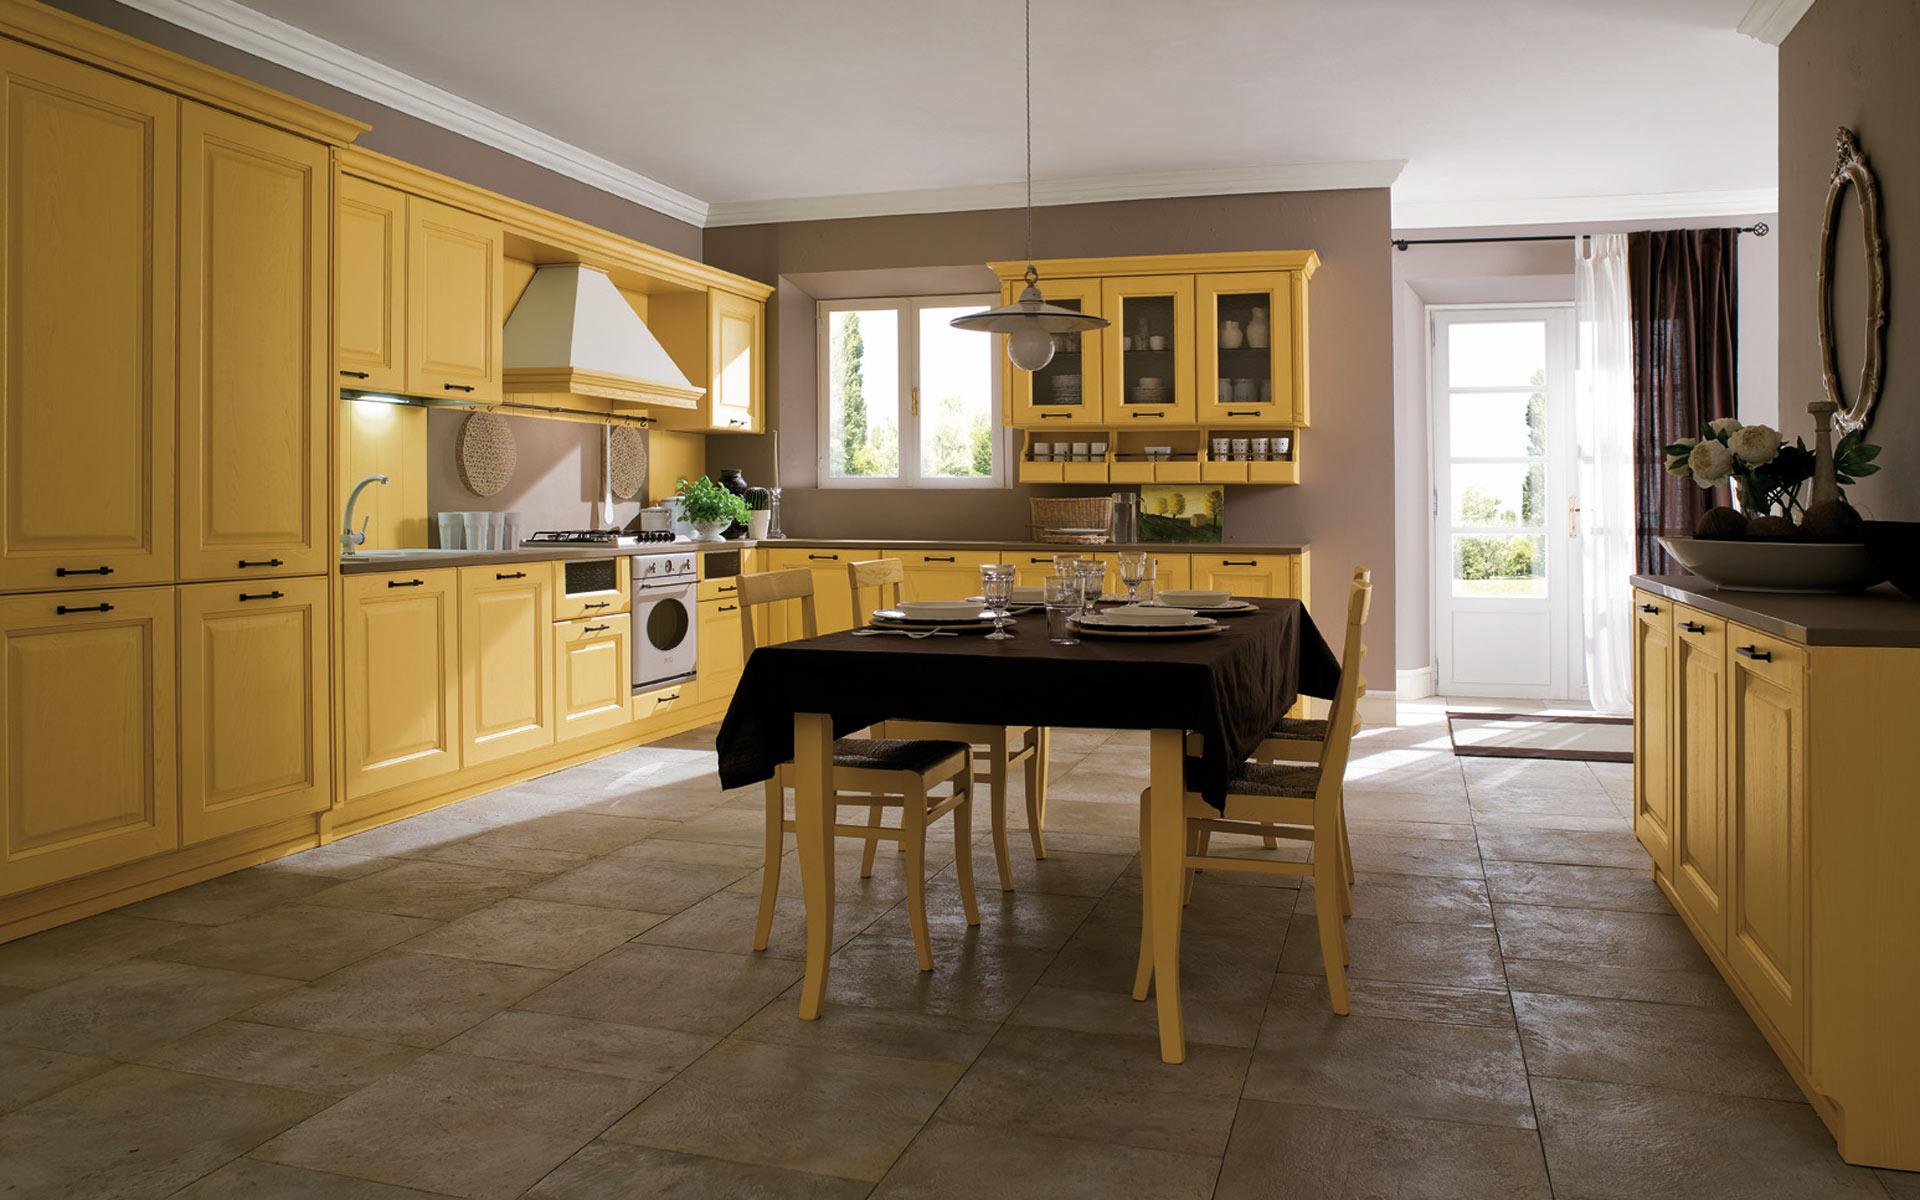 Gicinque cucine casa italia - Cucine gran casa ...